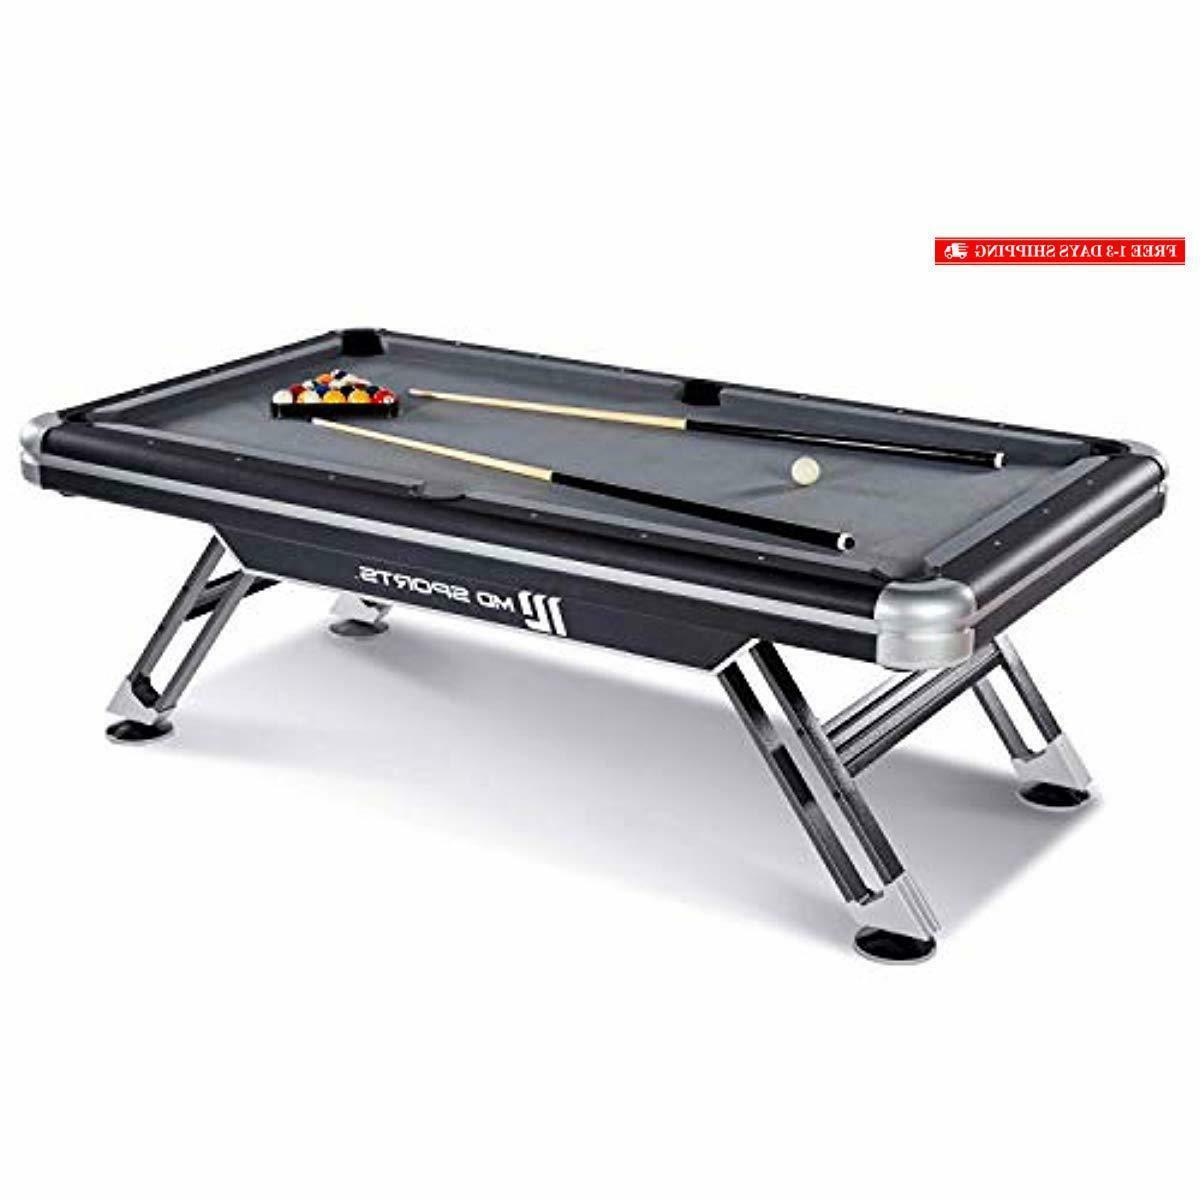 bll090 147m titan pool table black 7